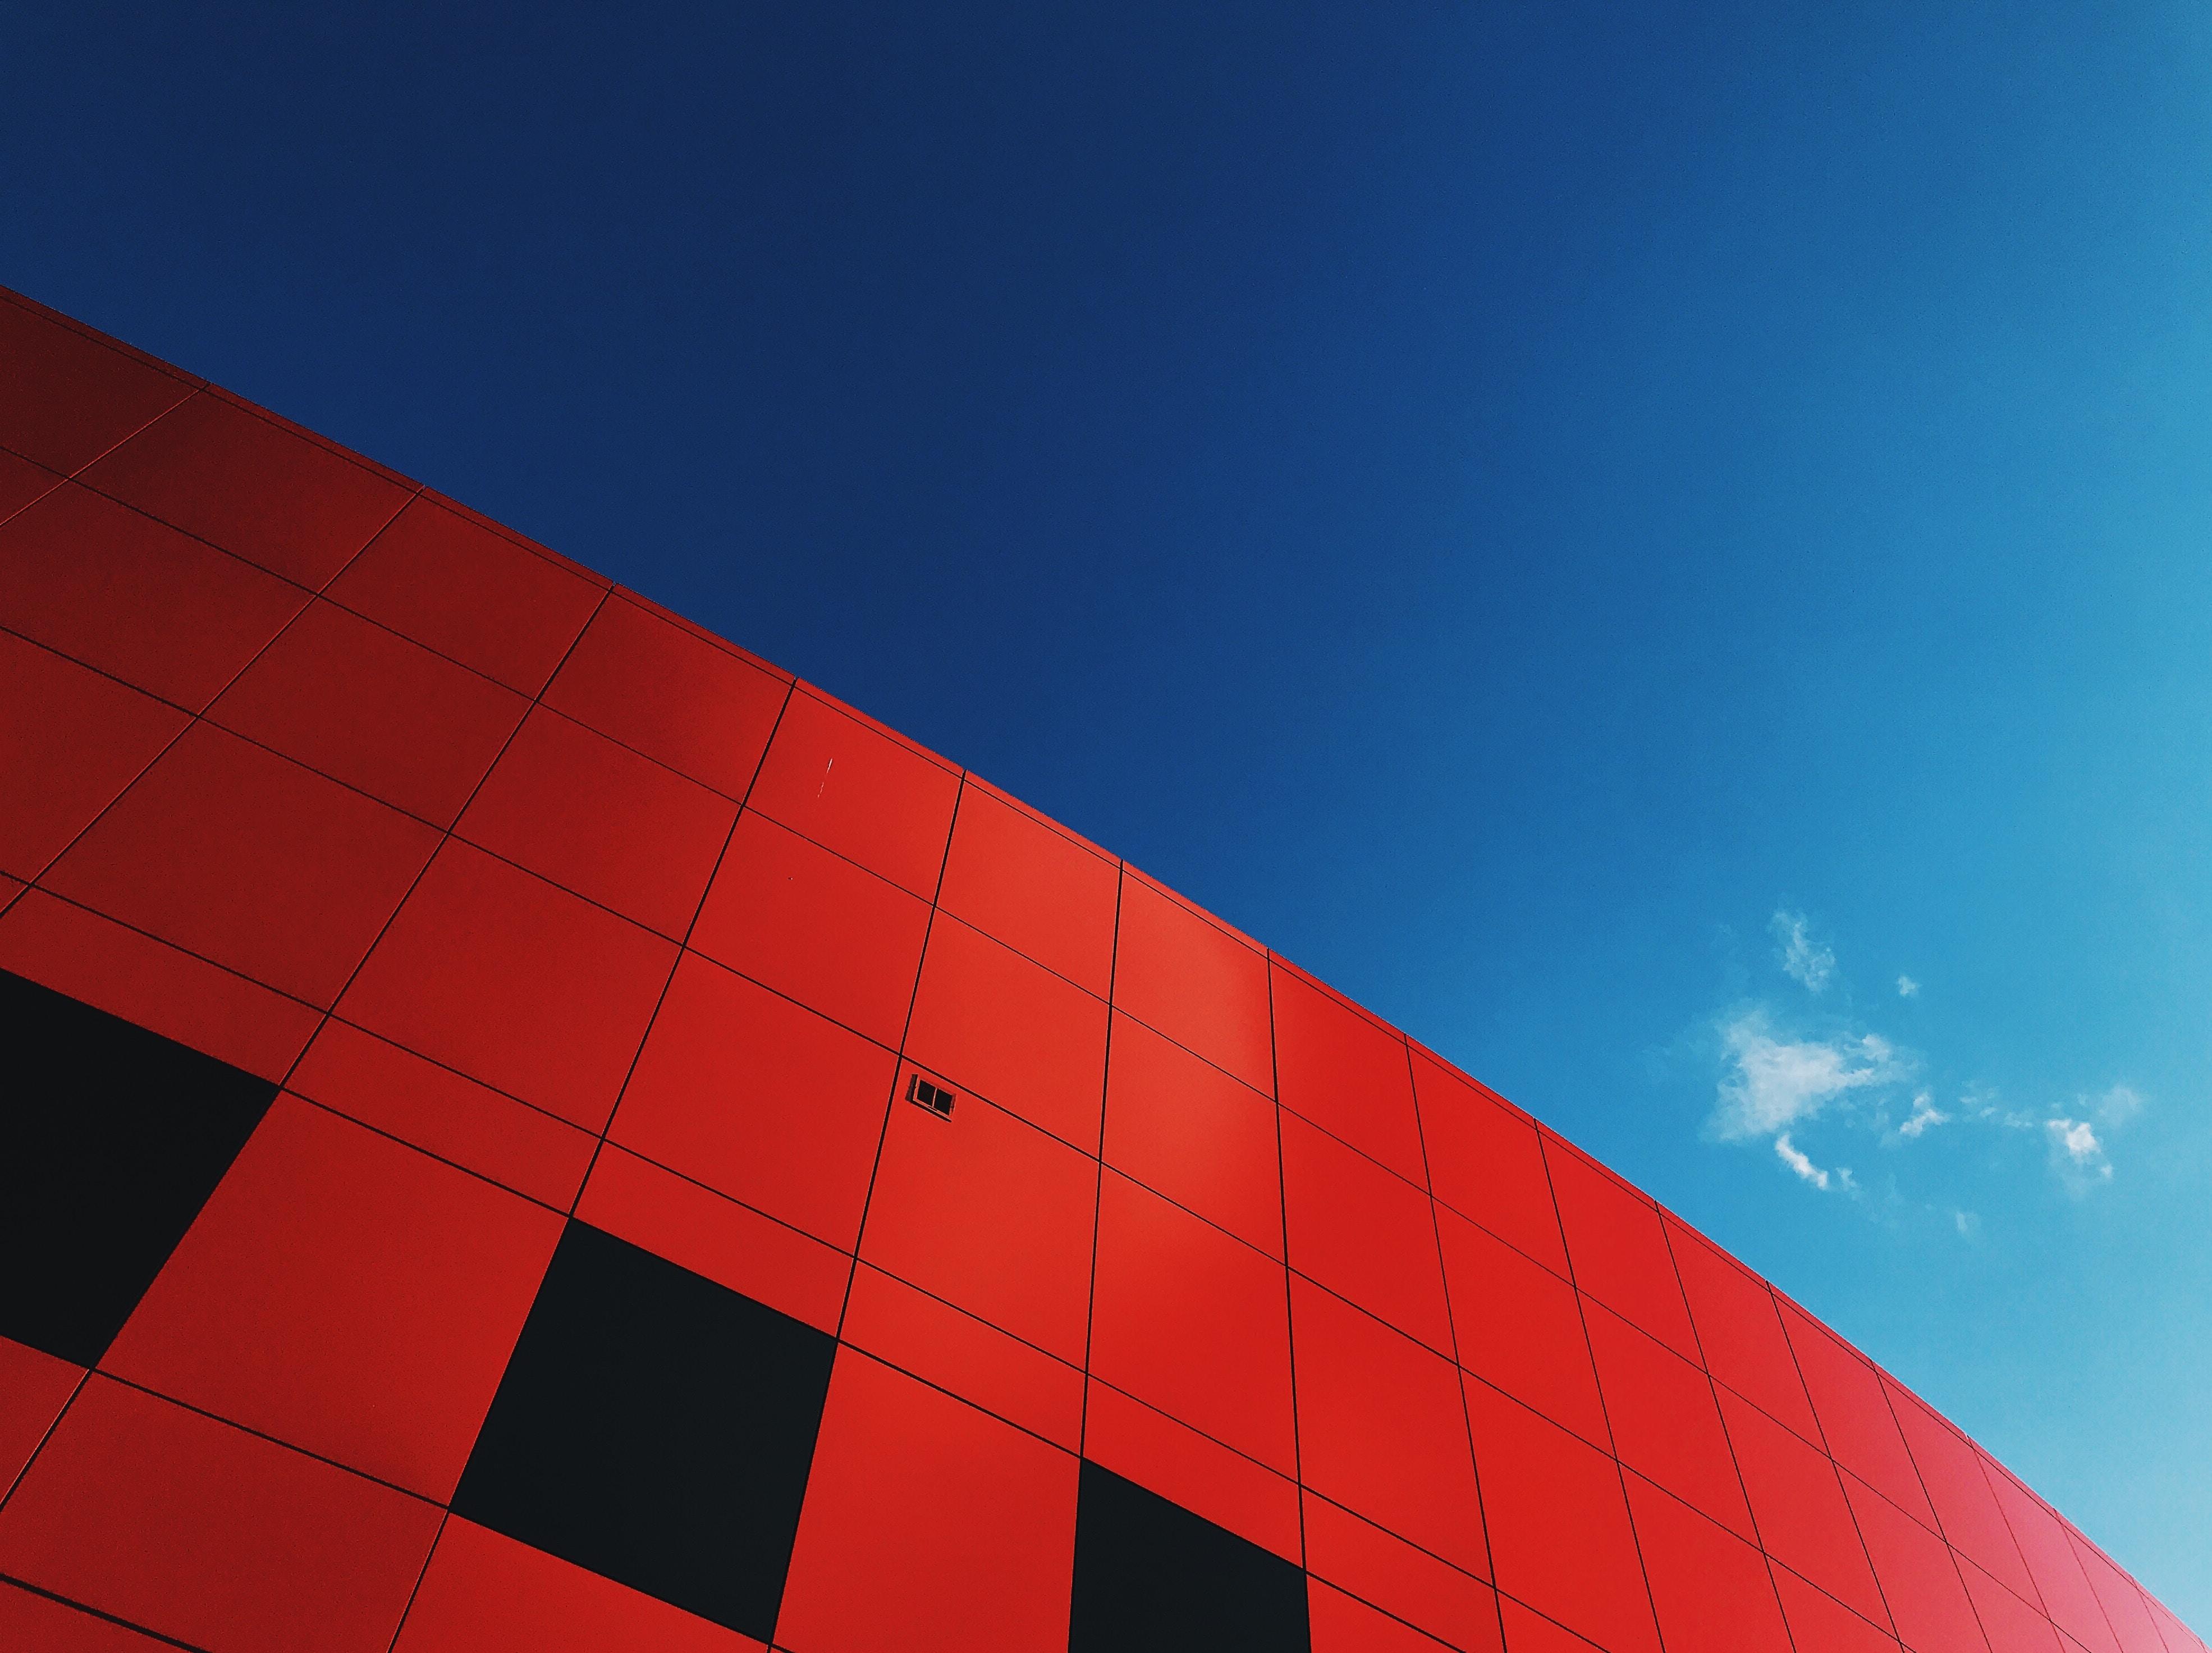 red hi-rise building